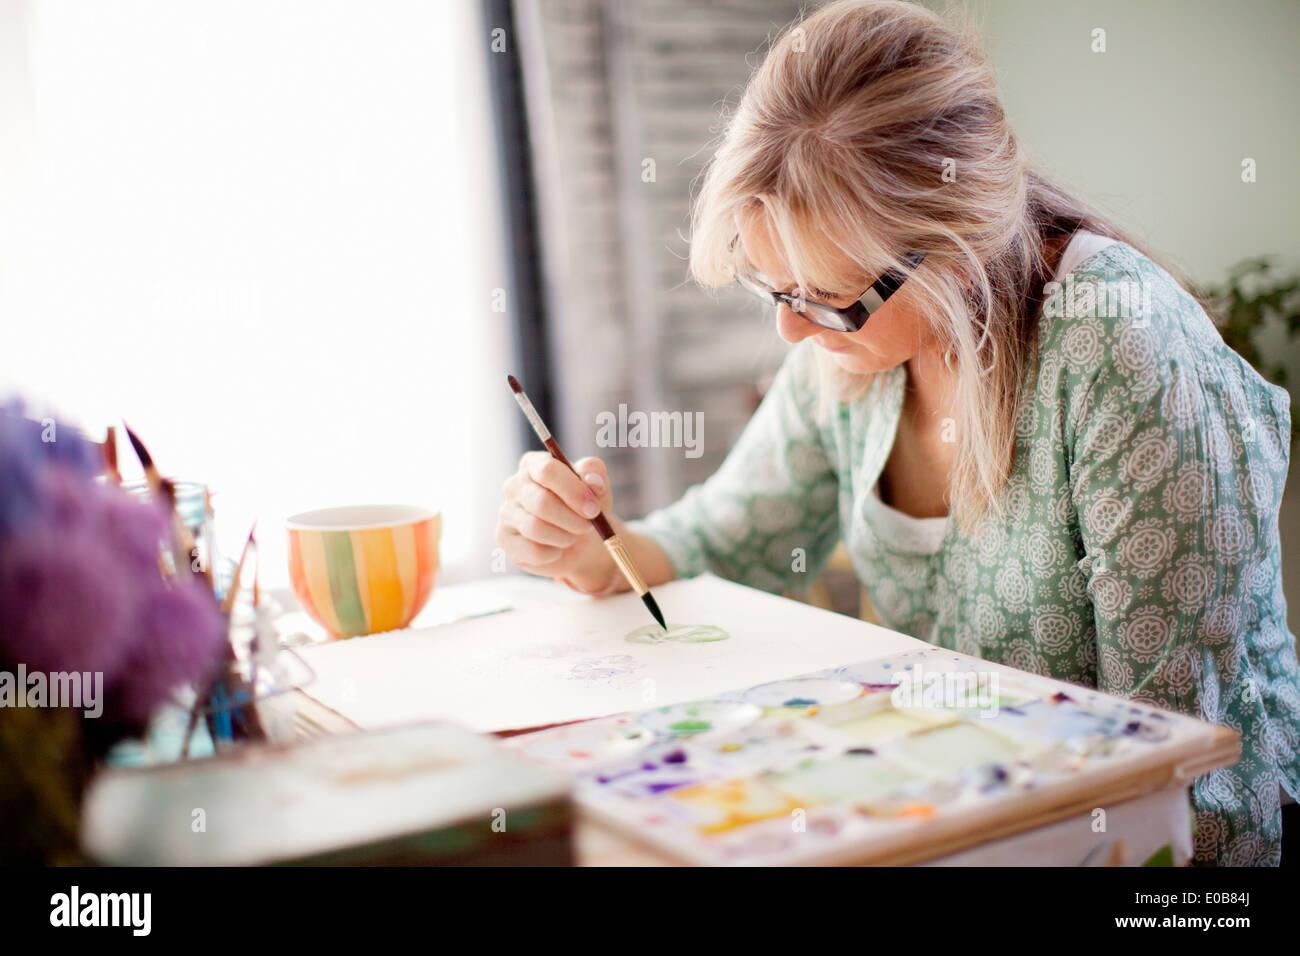 Reife Künstlerin Aquarell-Malerei im studio Stockbild